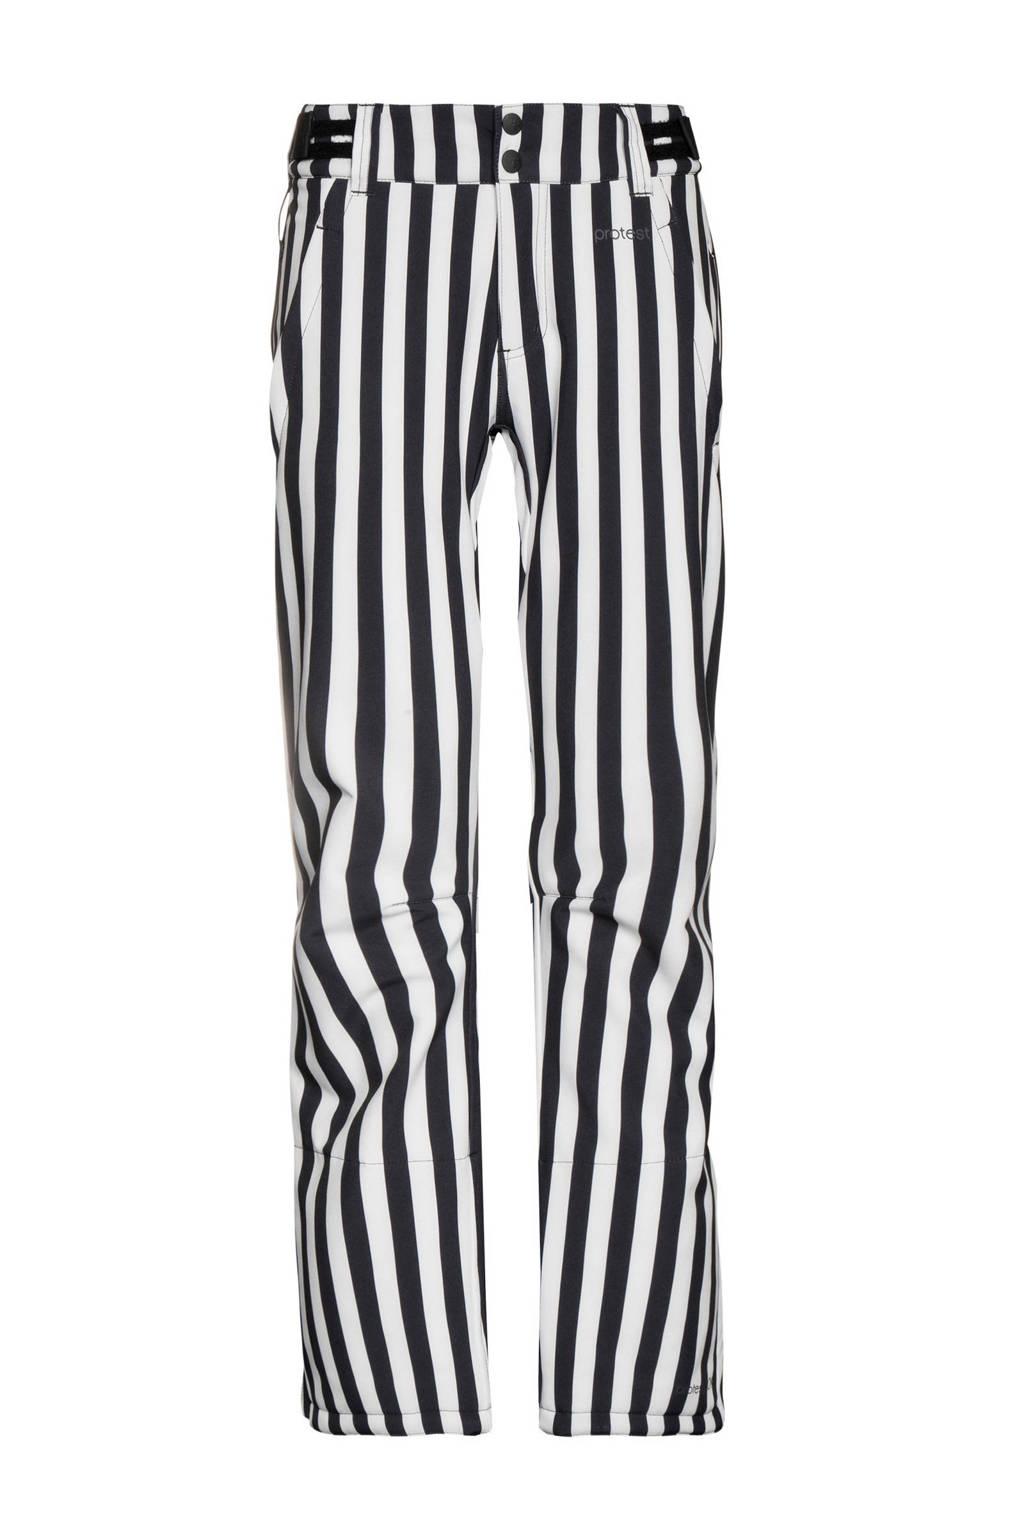 Protest softshell skibroek Angle 20 zwart/wit, Zwart/wit